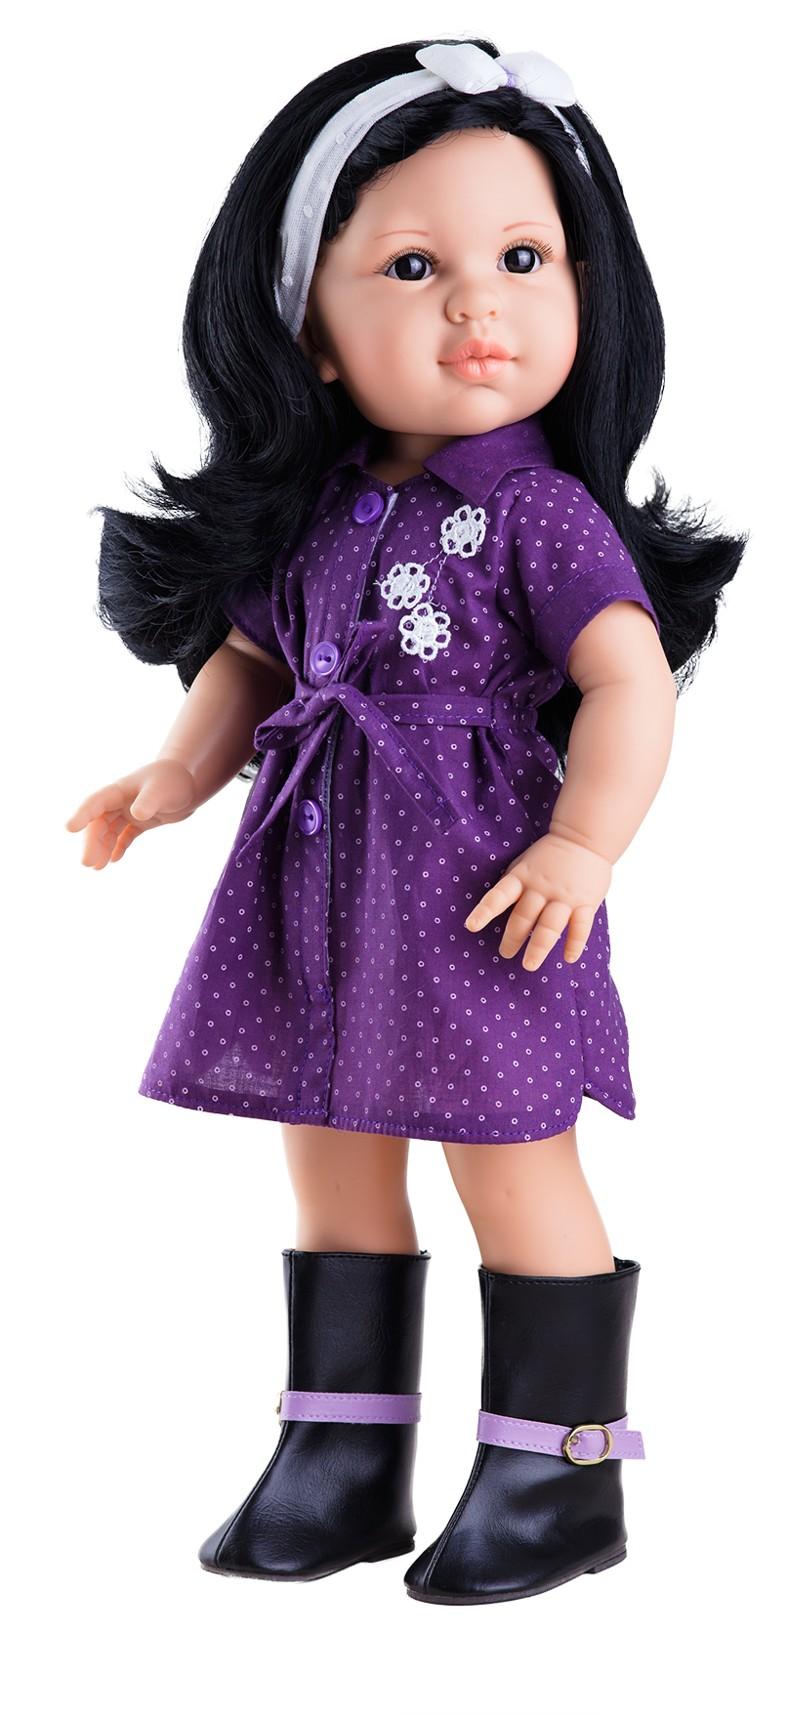 Realistická panenka Lina od firmy Paola Reina